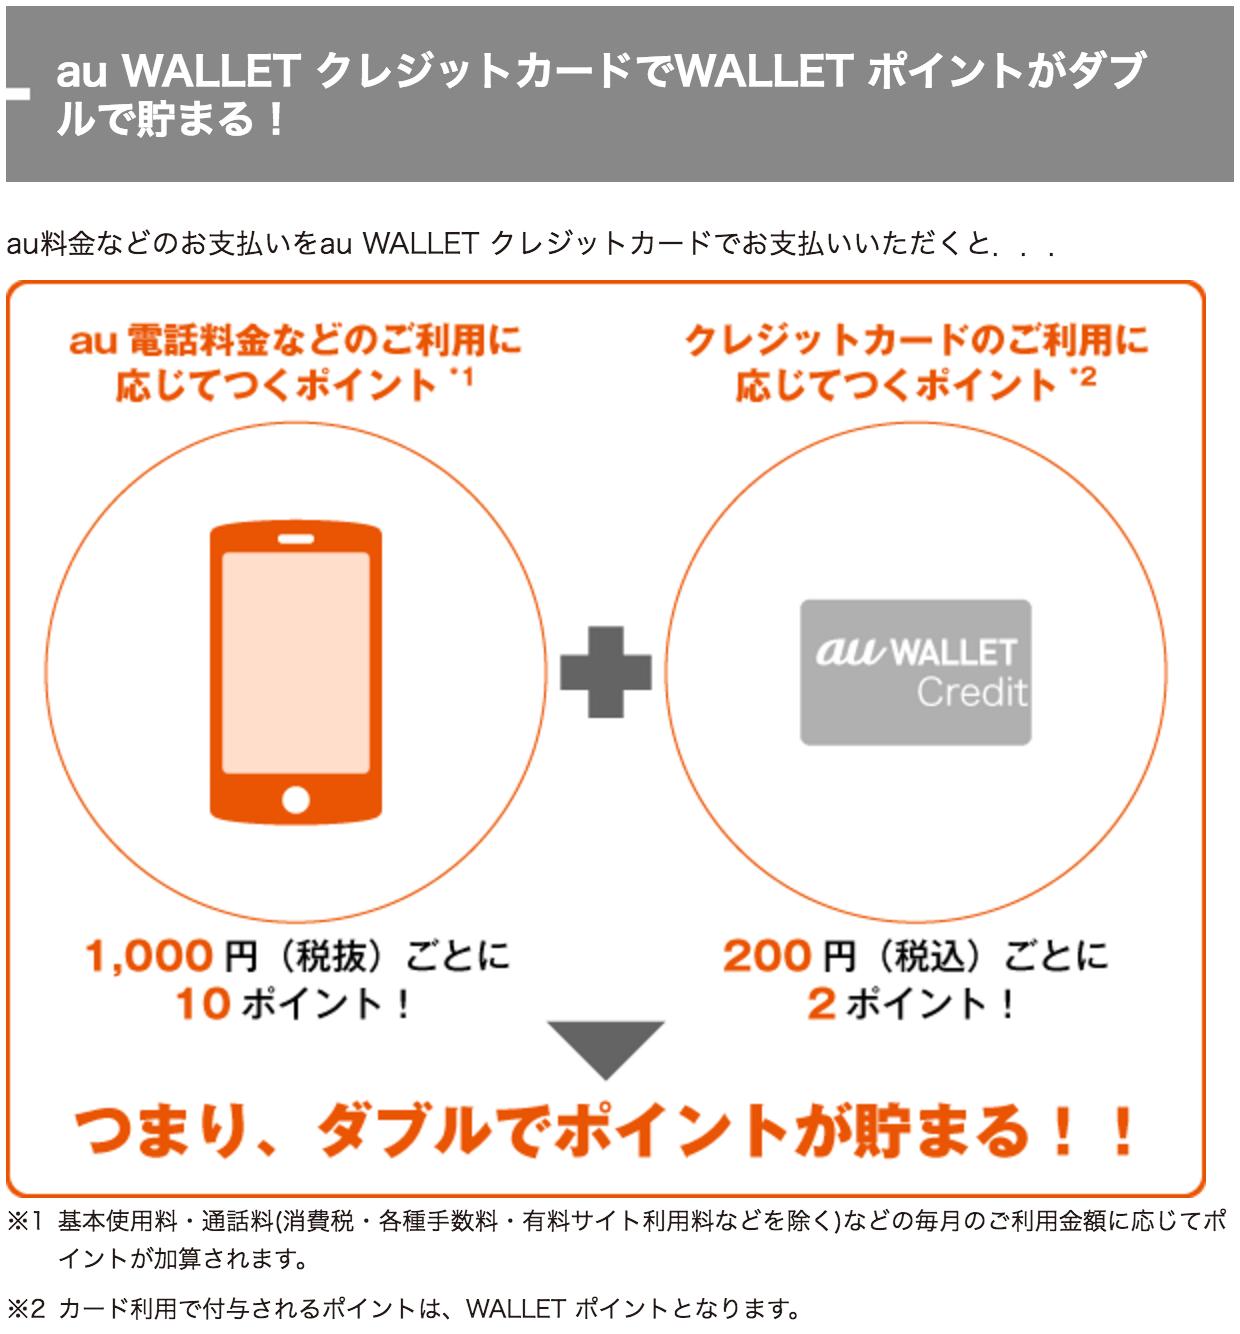 au WALLET クレジットカード ポイント ダブル